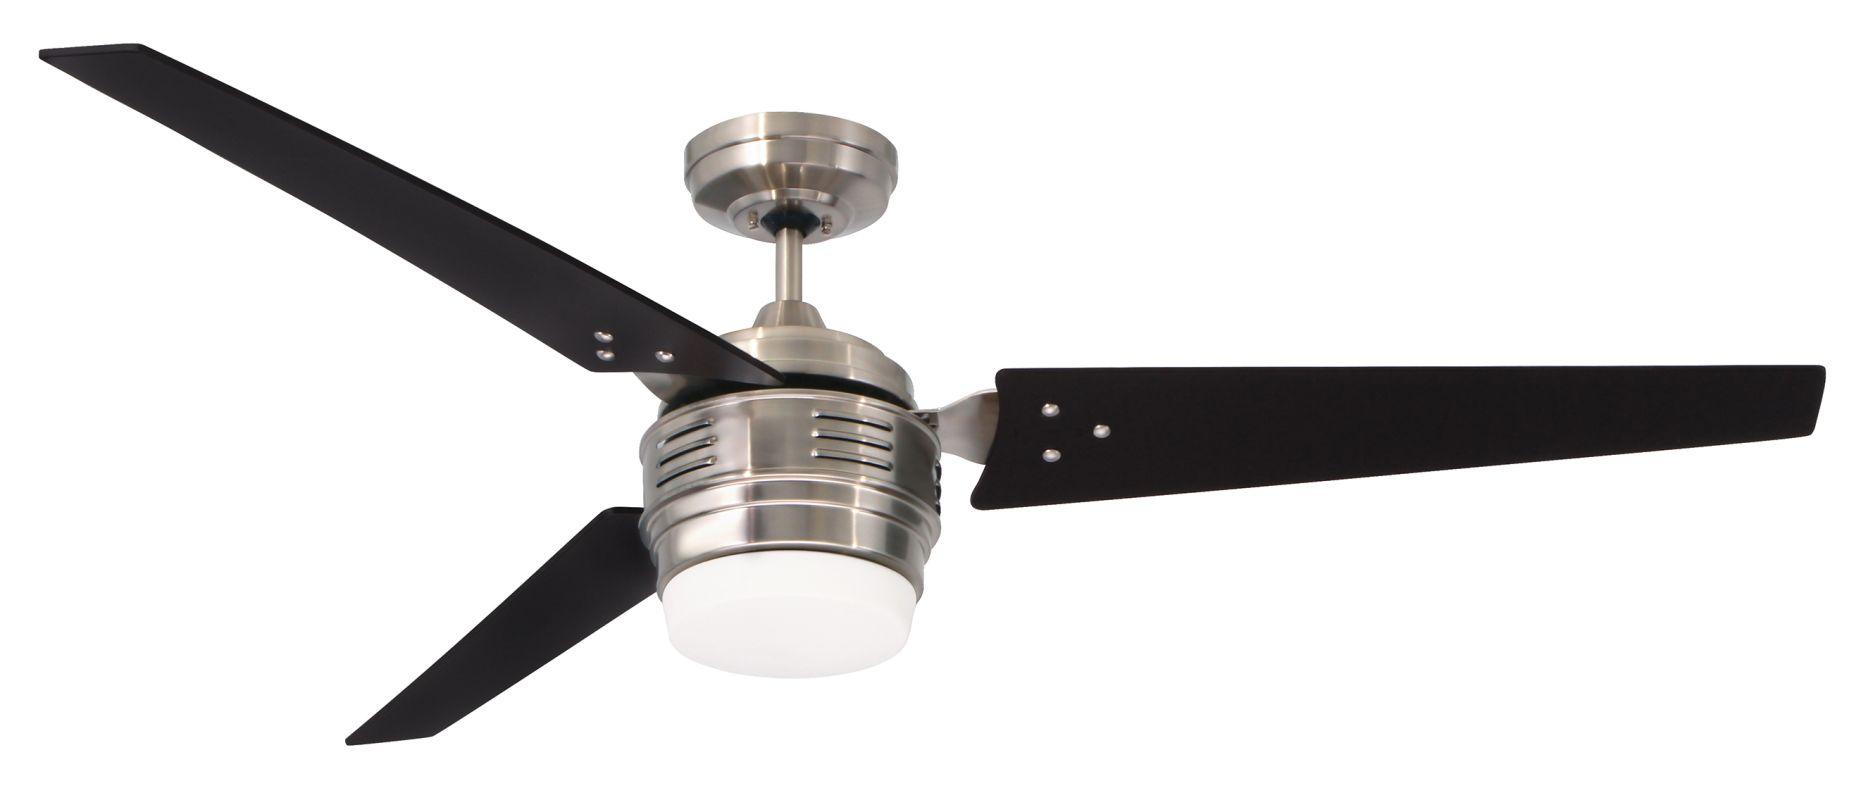 "Emerson CF766 4th Avenue 60"" 3 Blade Ceiling Fan - Blades Light Kit"